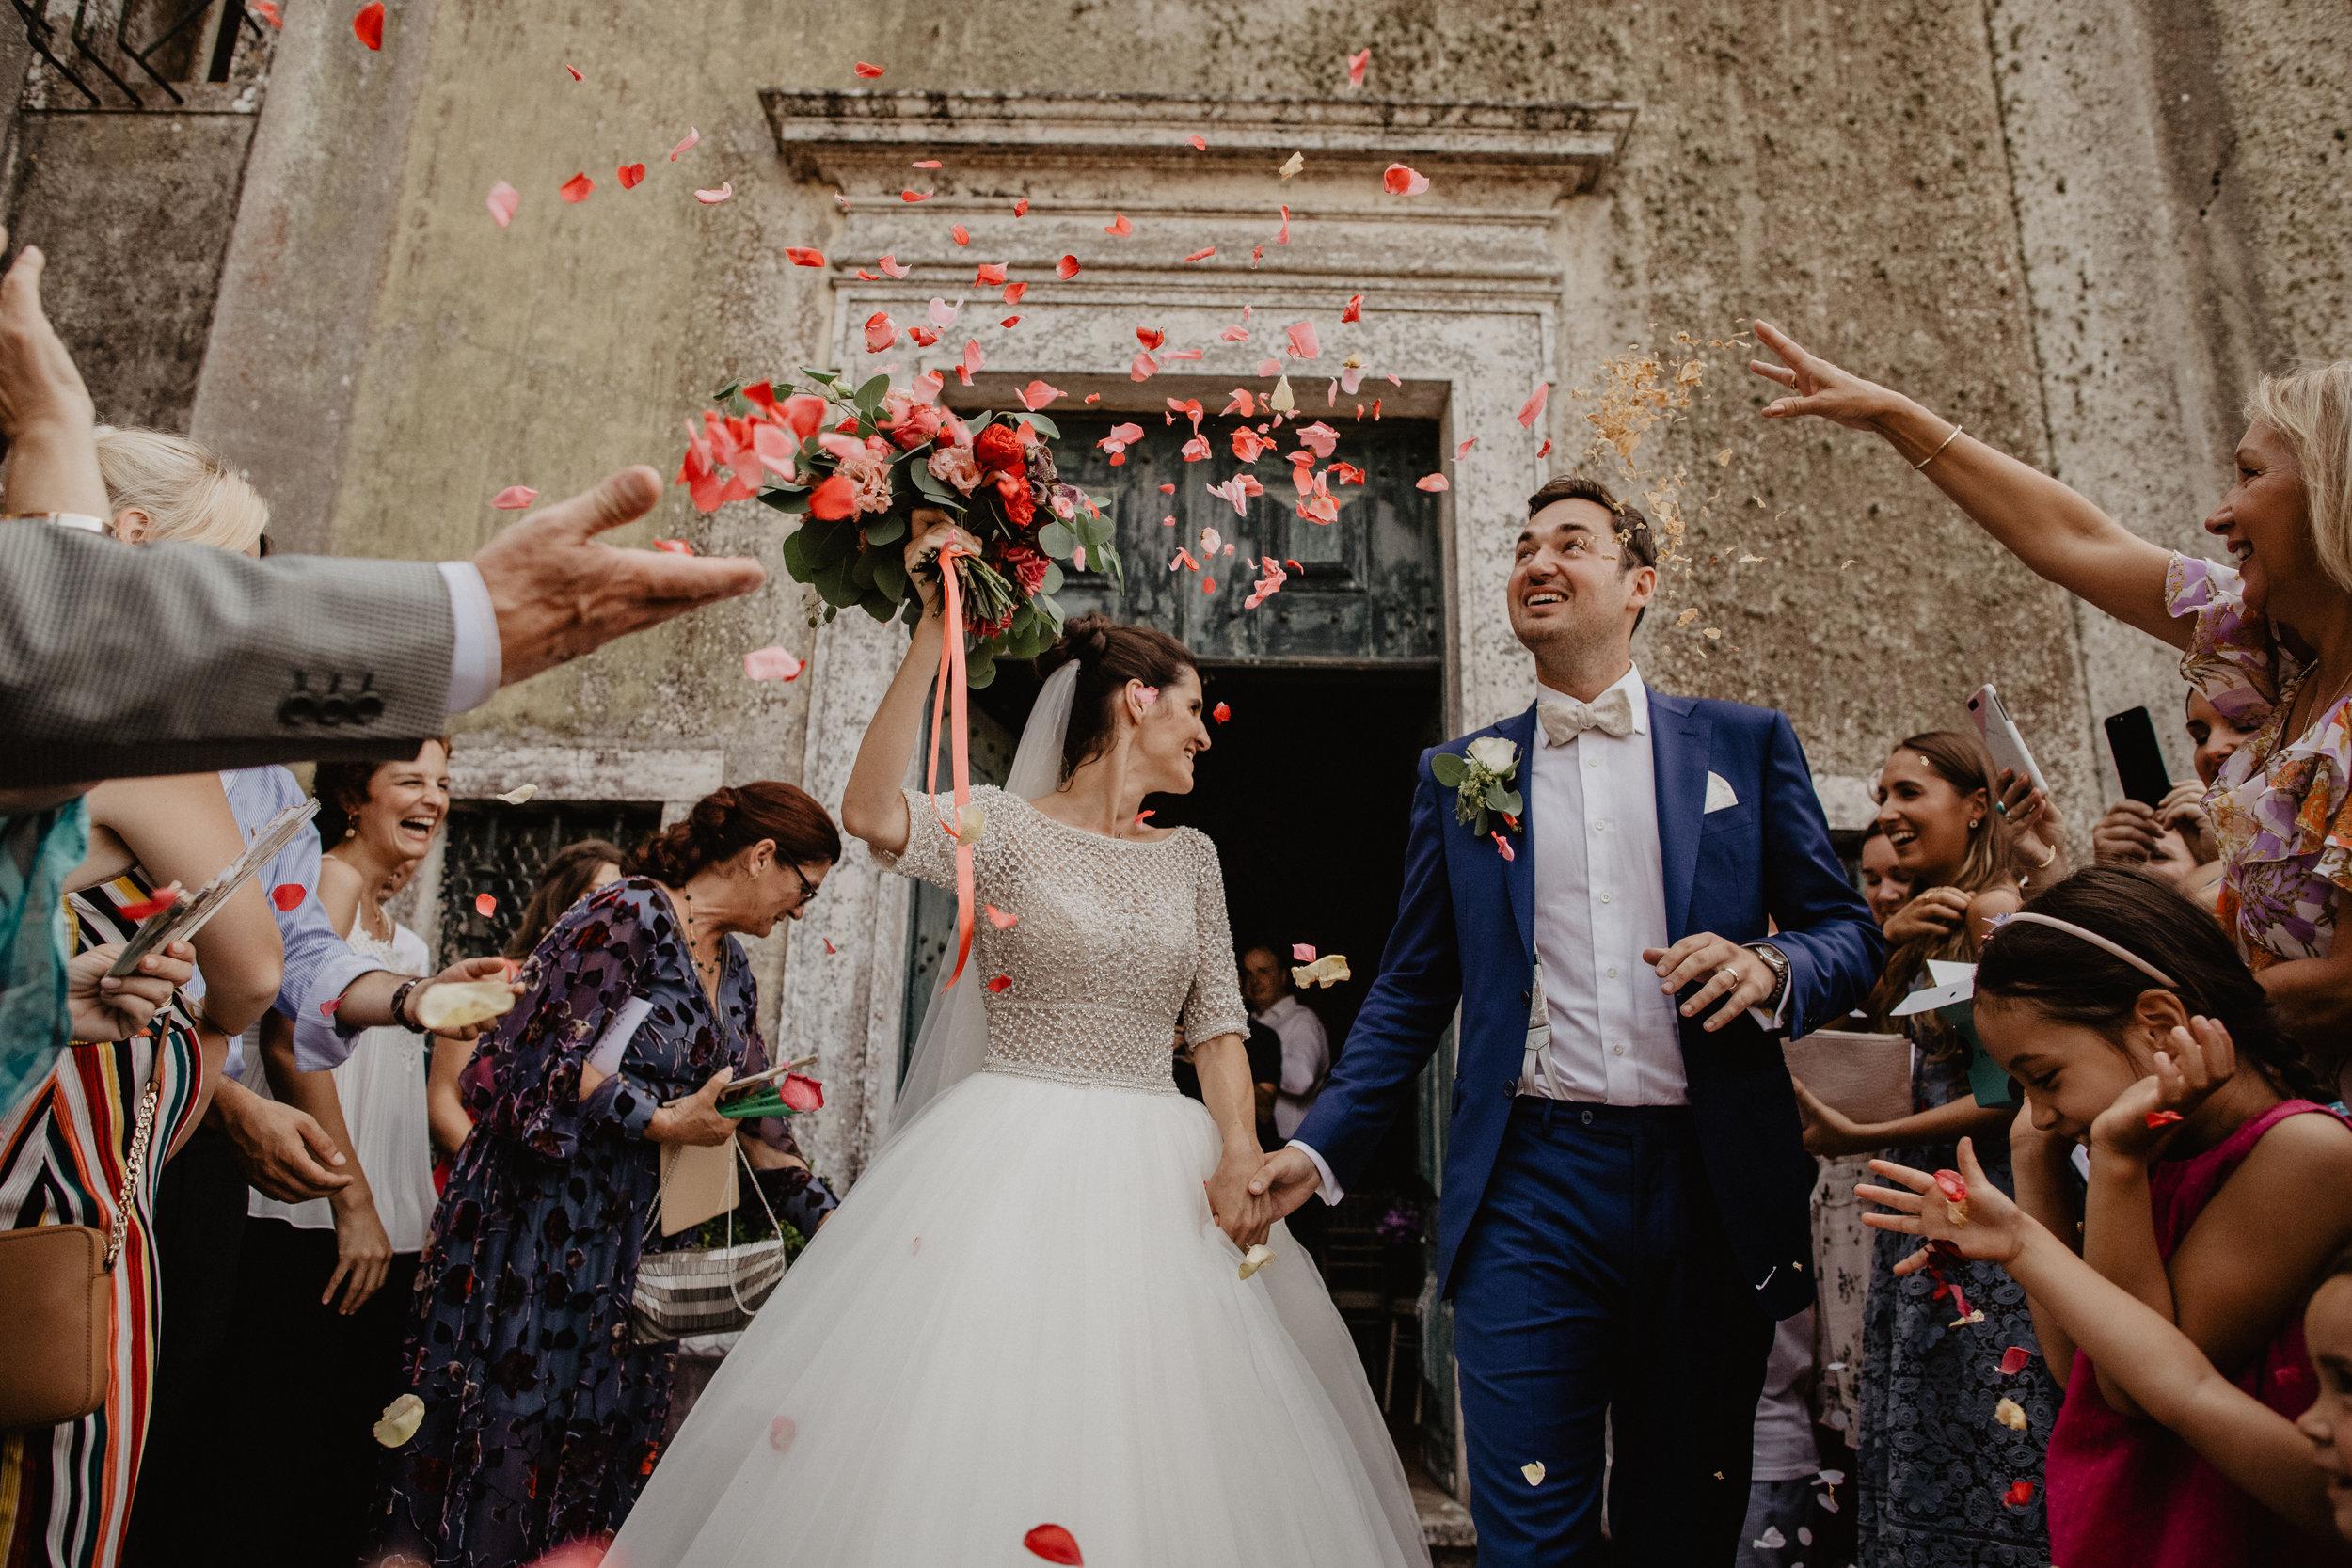 Lapela-photography-wedding-sintra-portugal-67.jpg